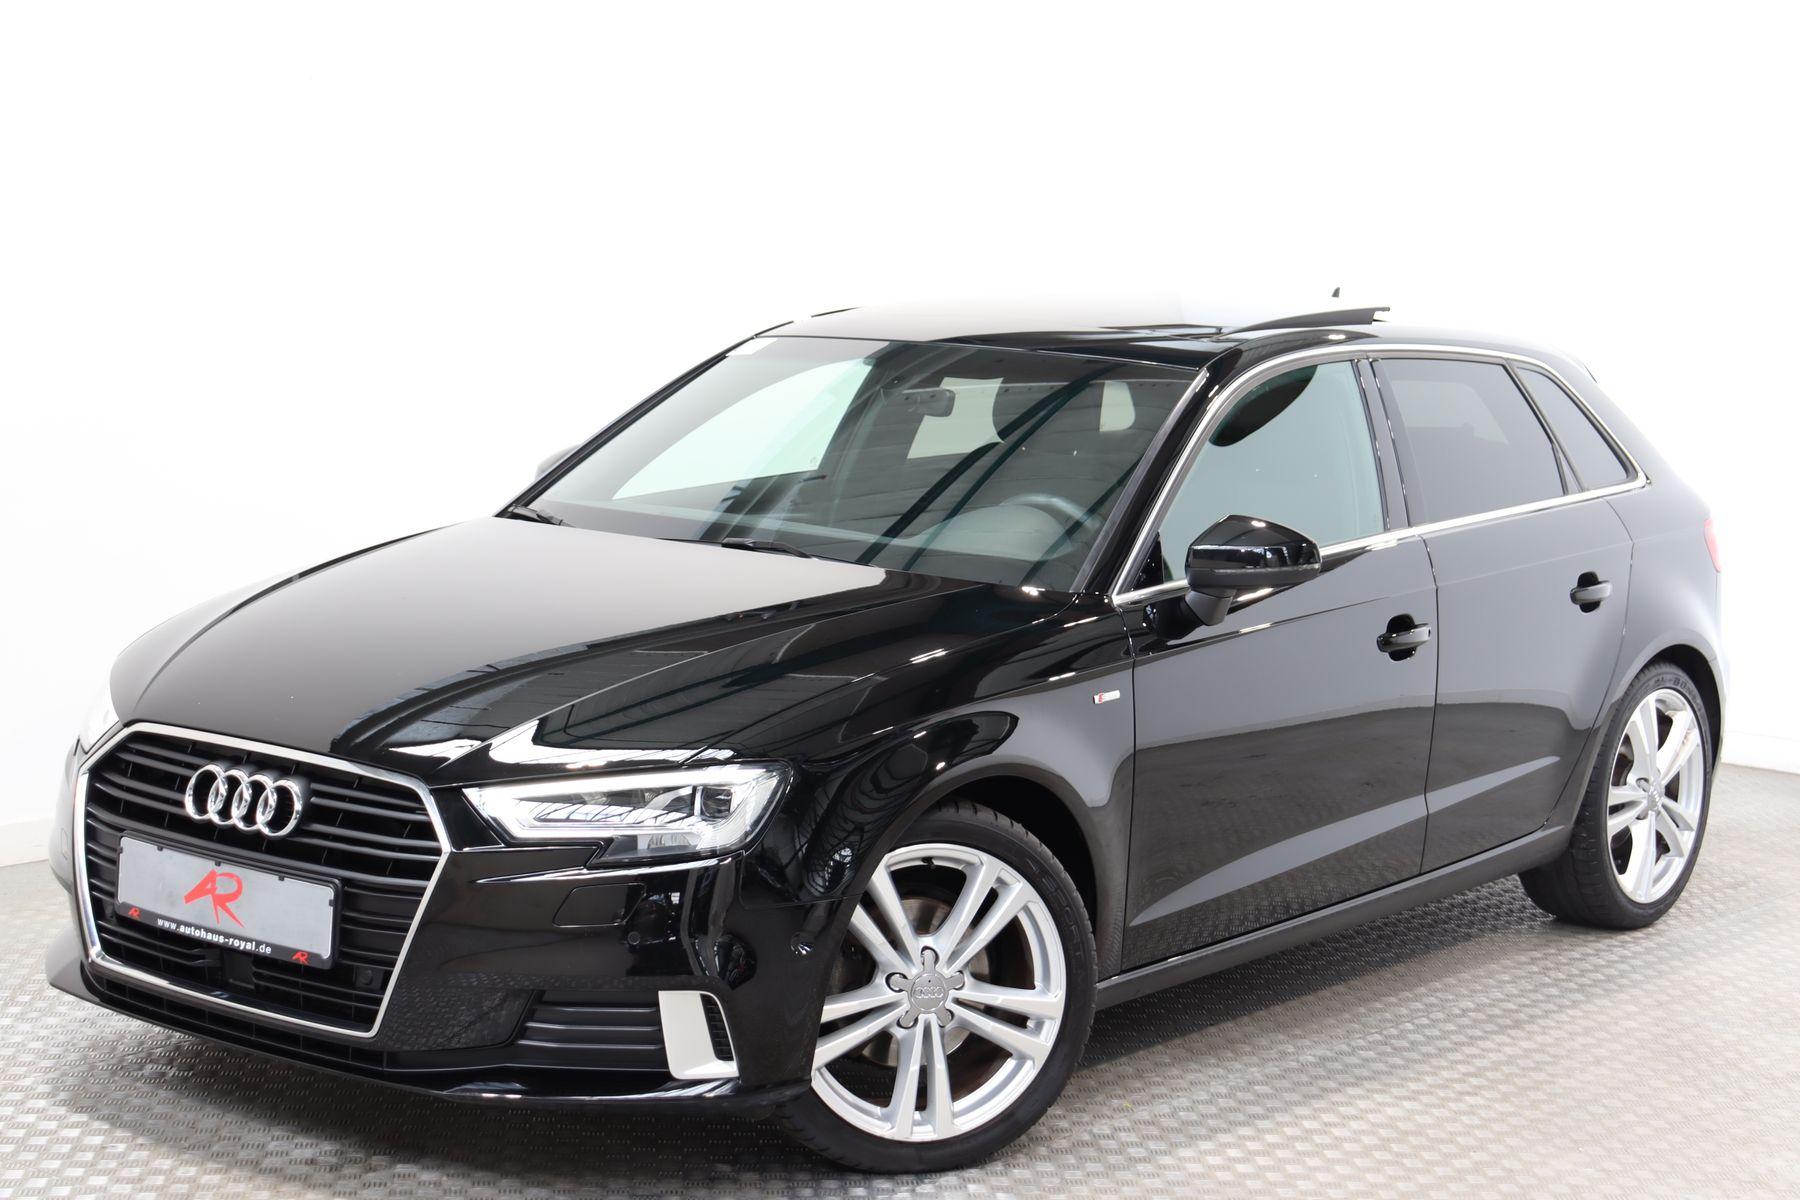 Audi A3 SB 2.0 TDI S LINE ACC,PARKASSIST,PANORAMA,LED, Jahr 2017, Diesel